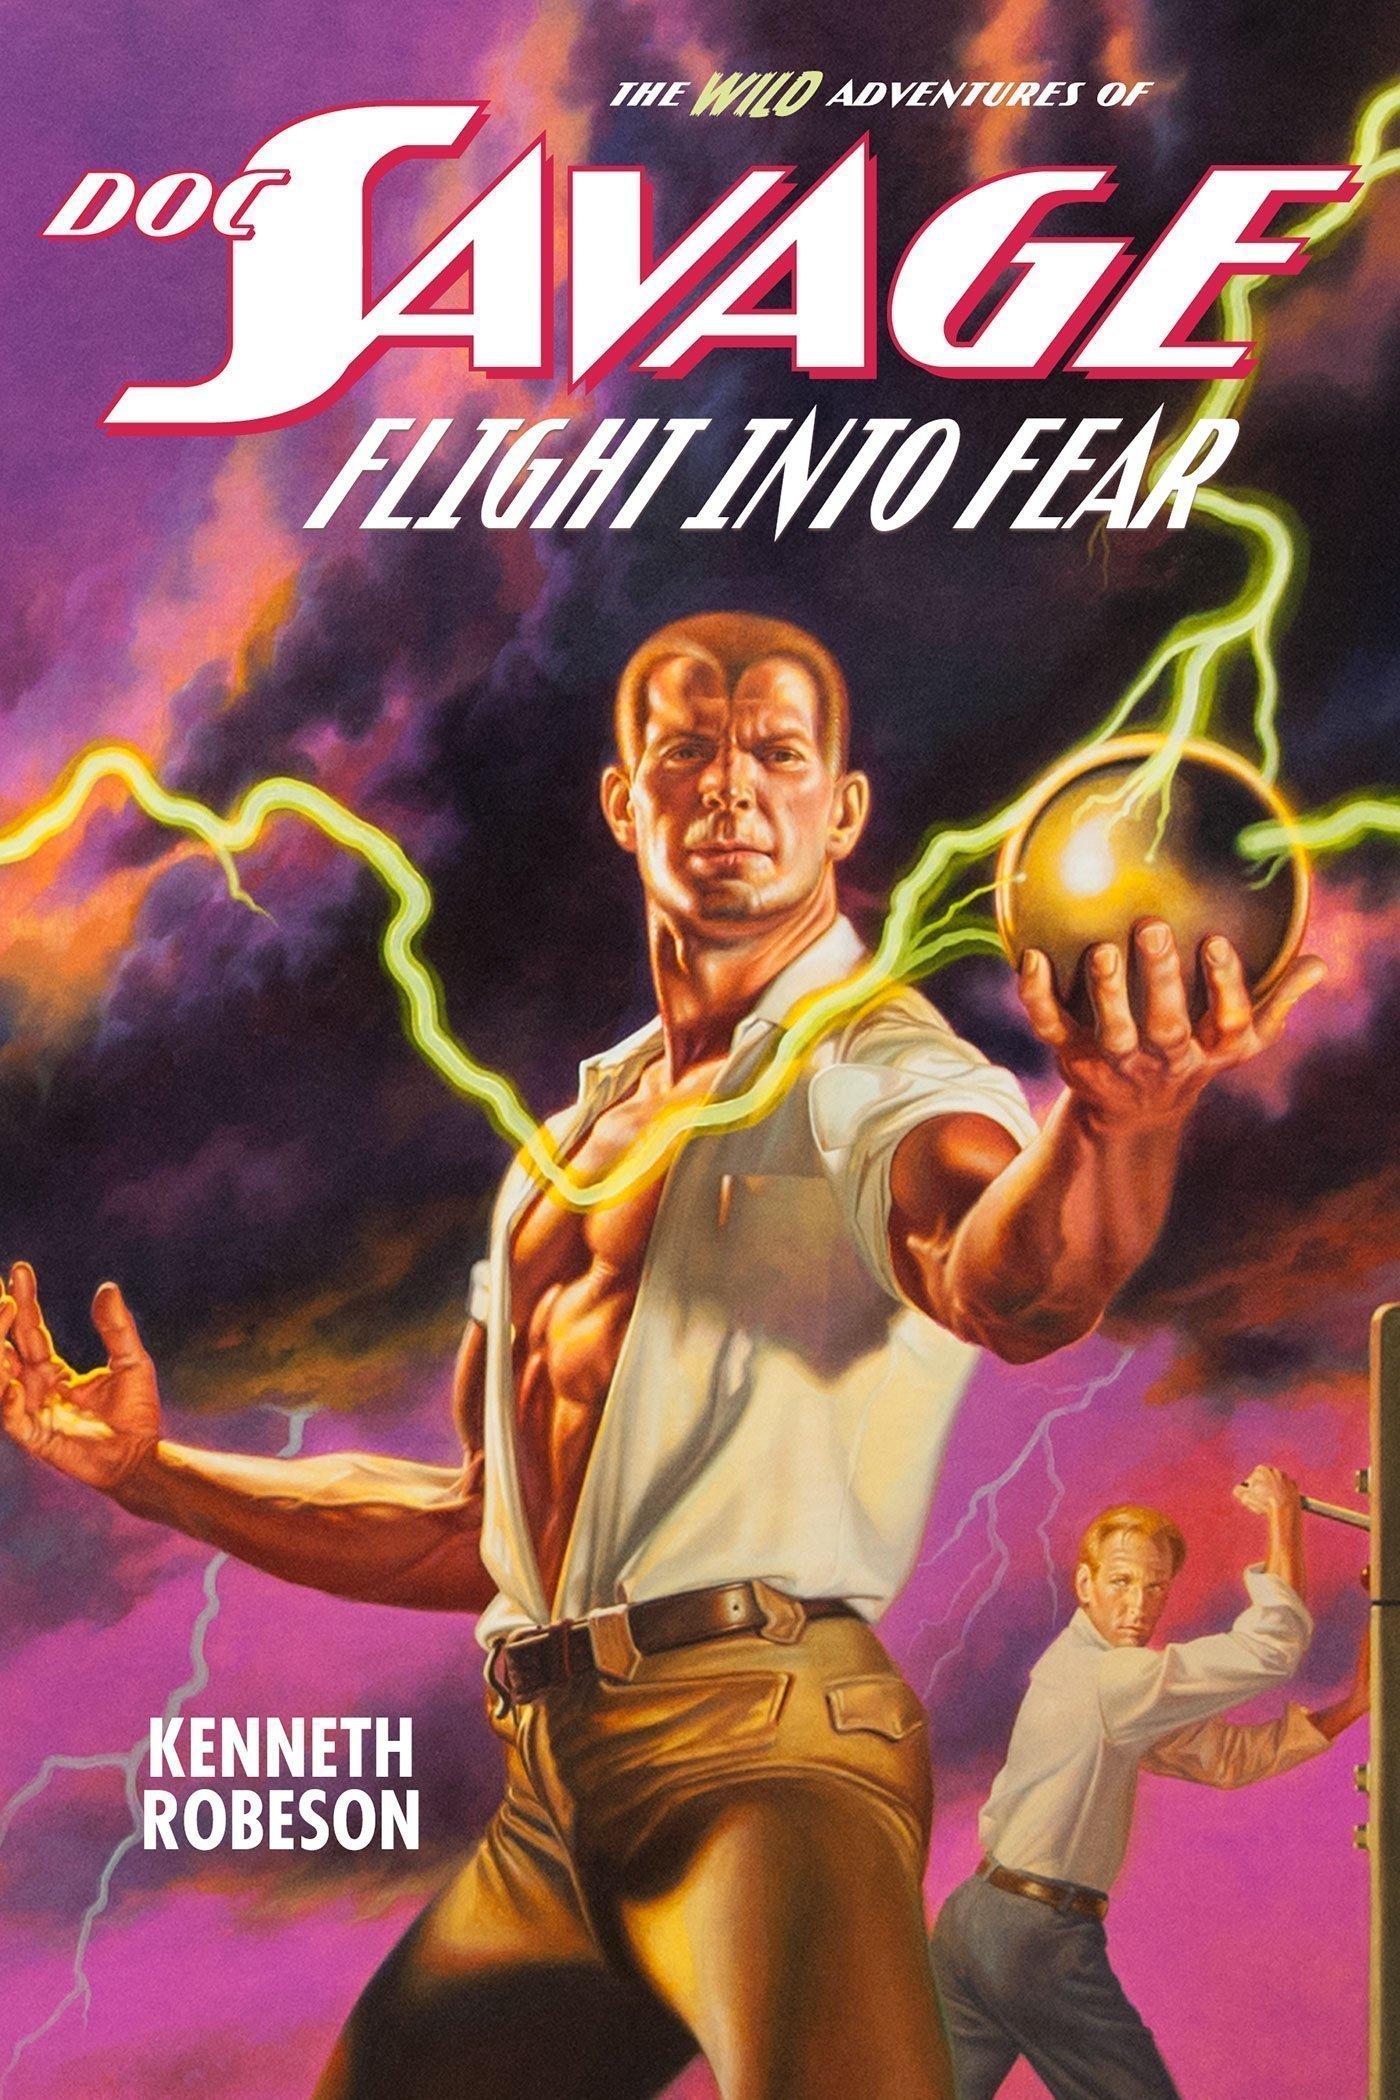 Doc Savage: Flight Into Fear